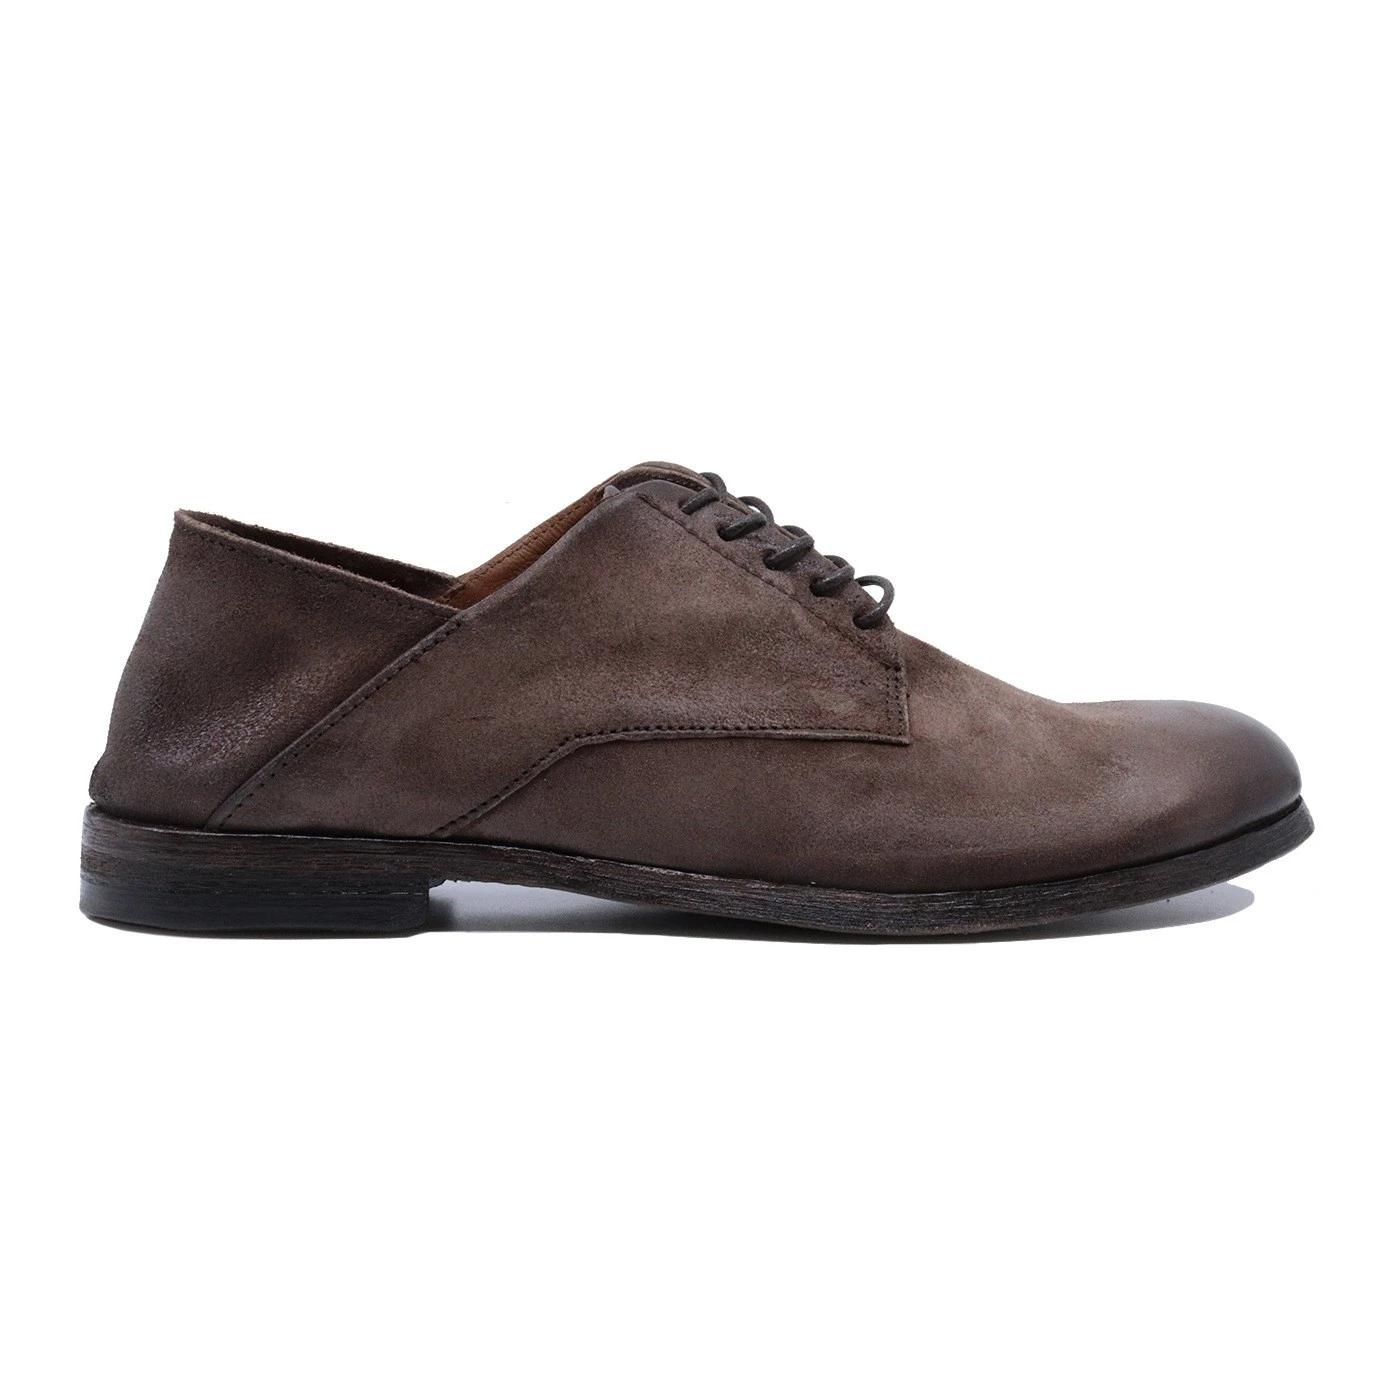 A.S. 98 U41102 scarpa allacciata da uomo in pelle fondente